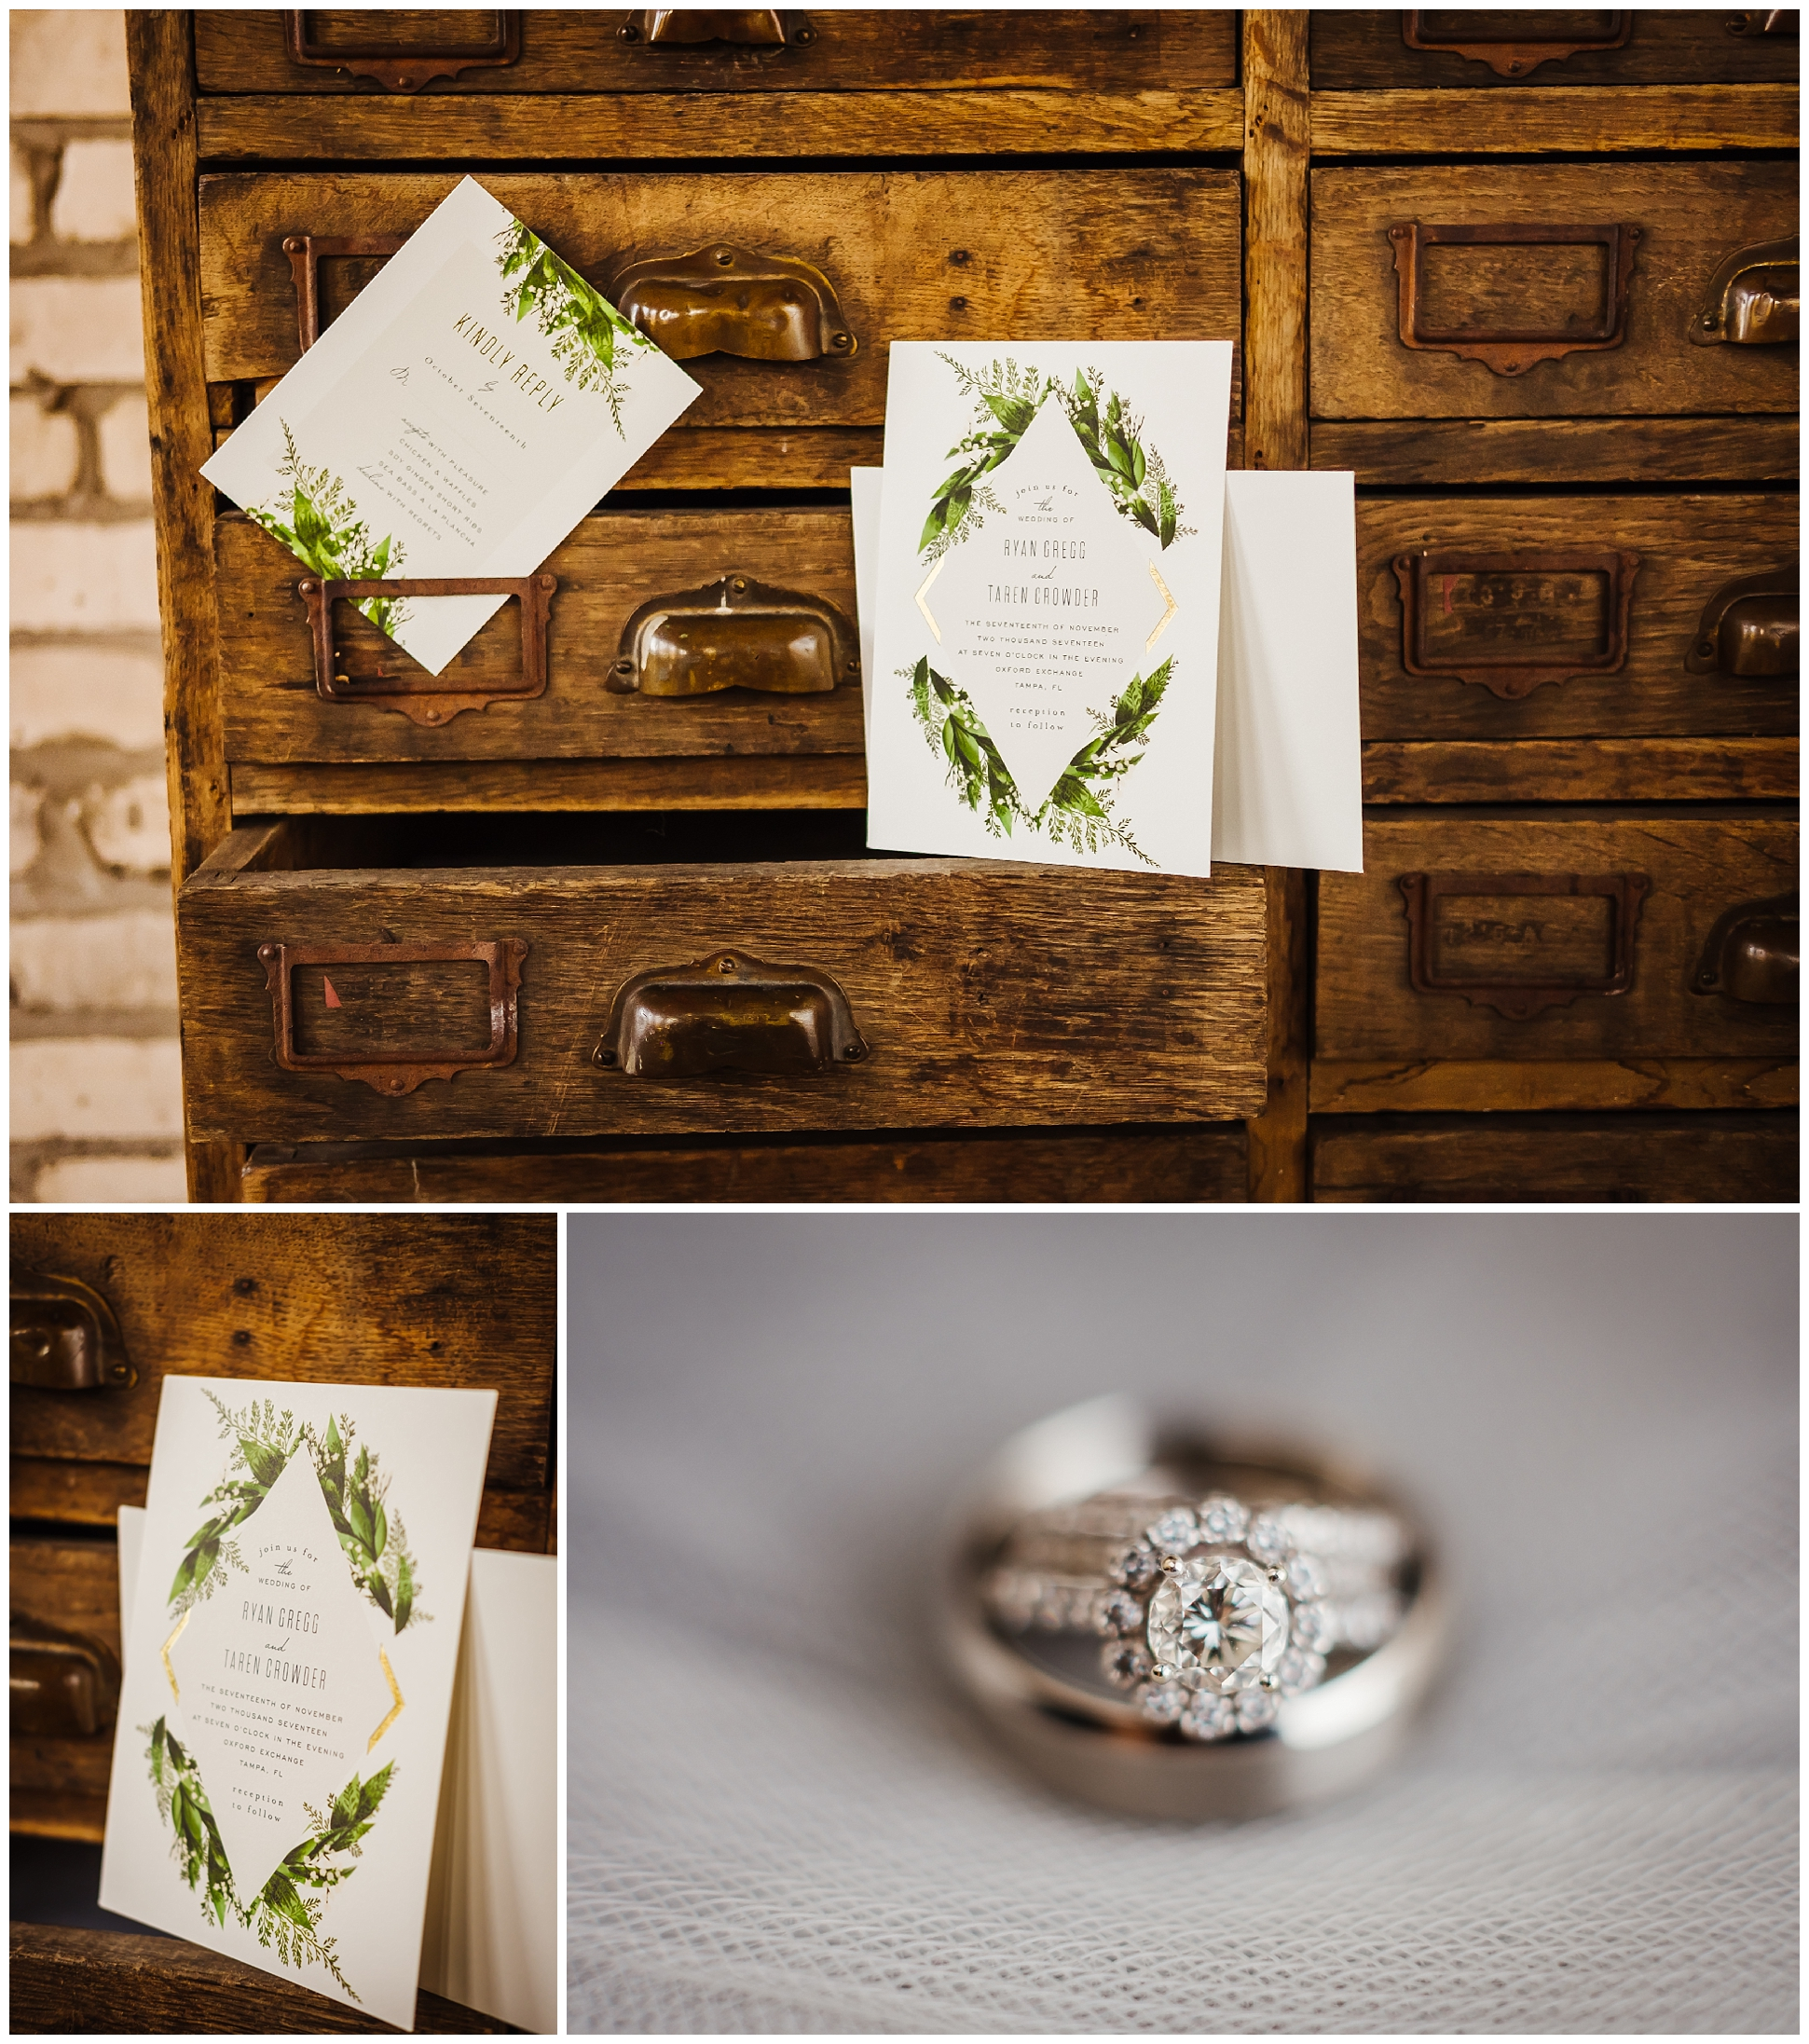 tampa-wedding-photographer-oxford-exchange-garland-candlelight-gold-hayley-paige_0005.jpg